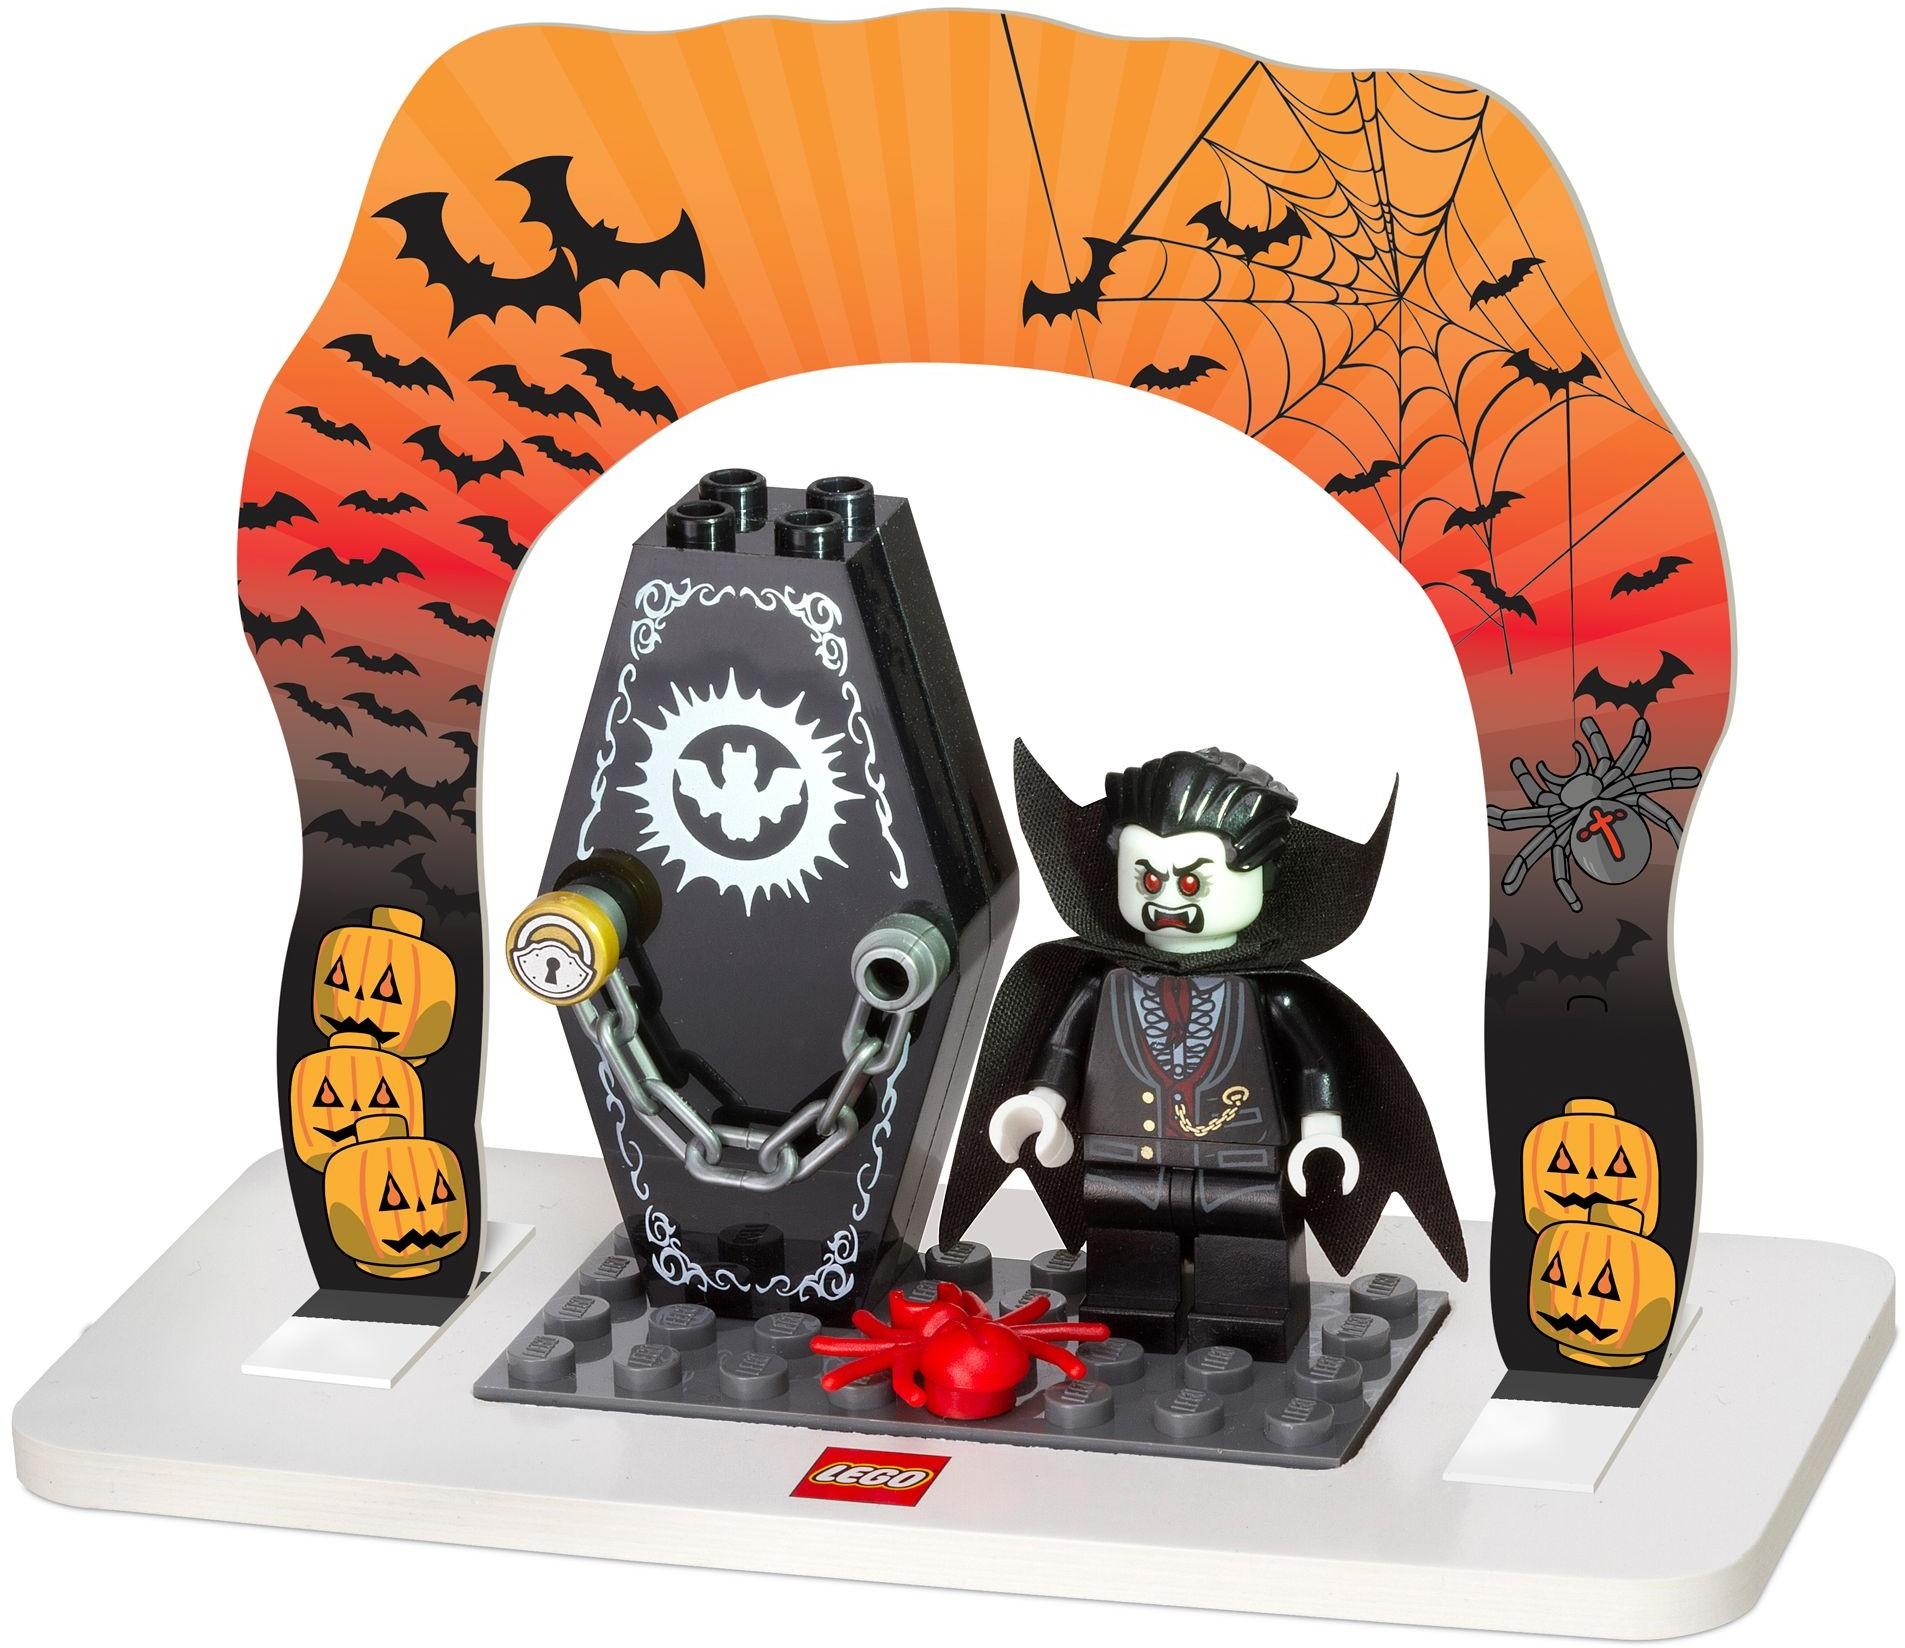 lego vampires mini set